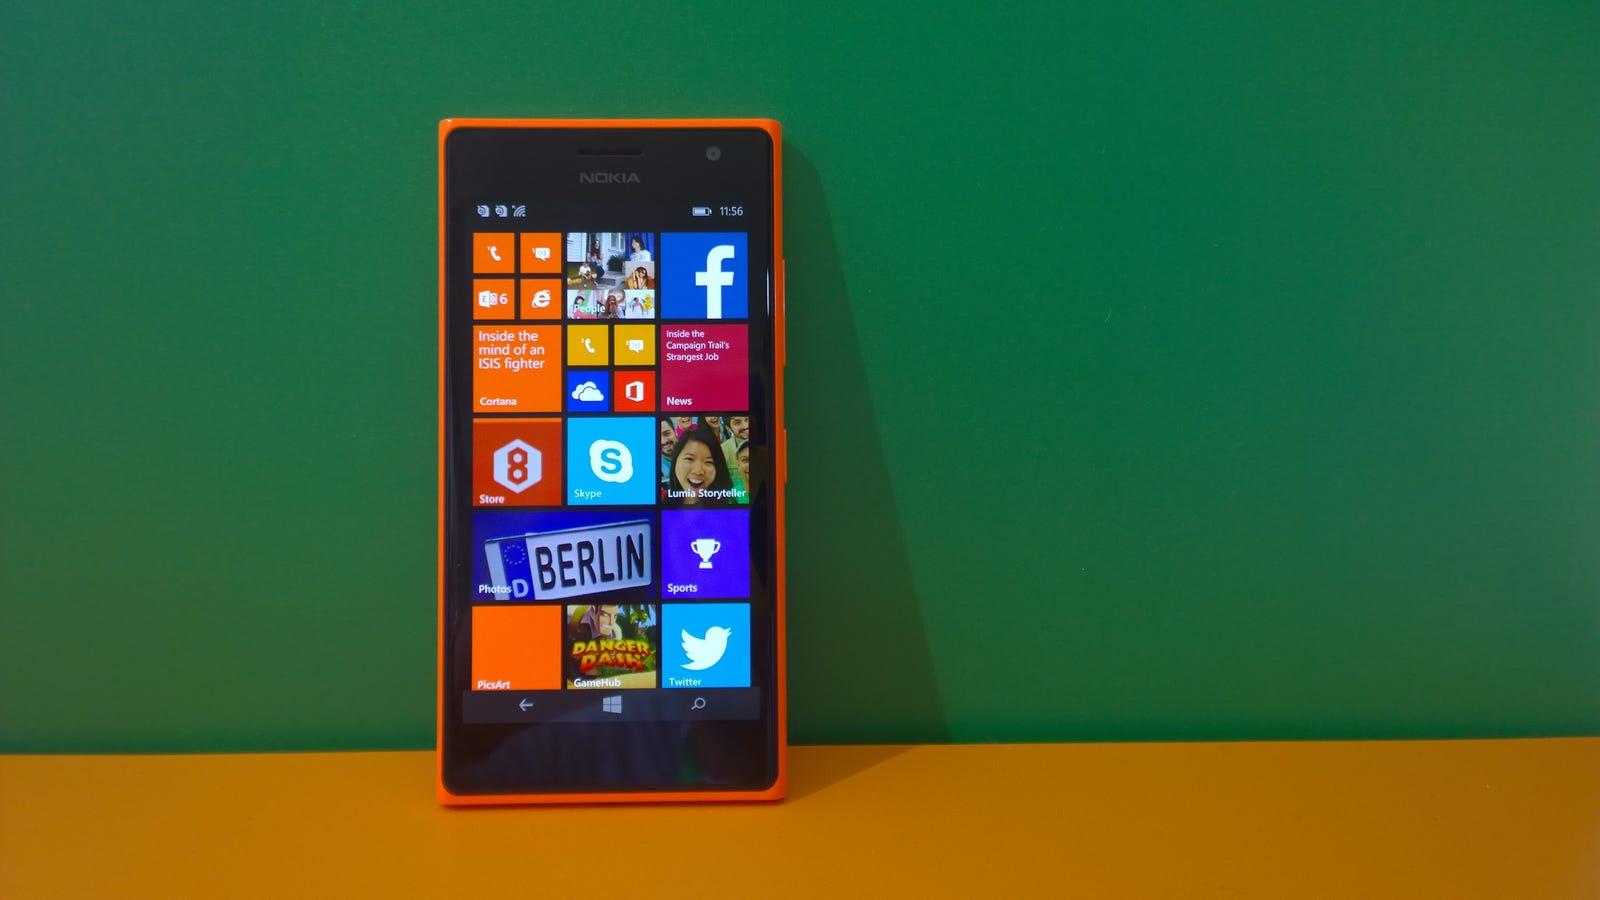 Nokia lumia 735 microsoft ya tiene su m vil para selfies for Primicias ya para movil